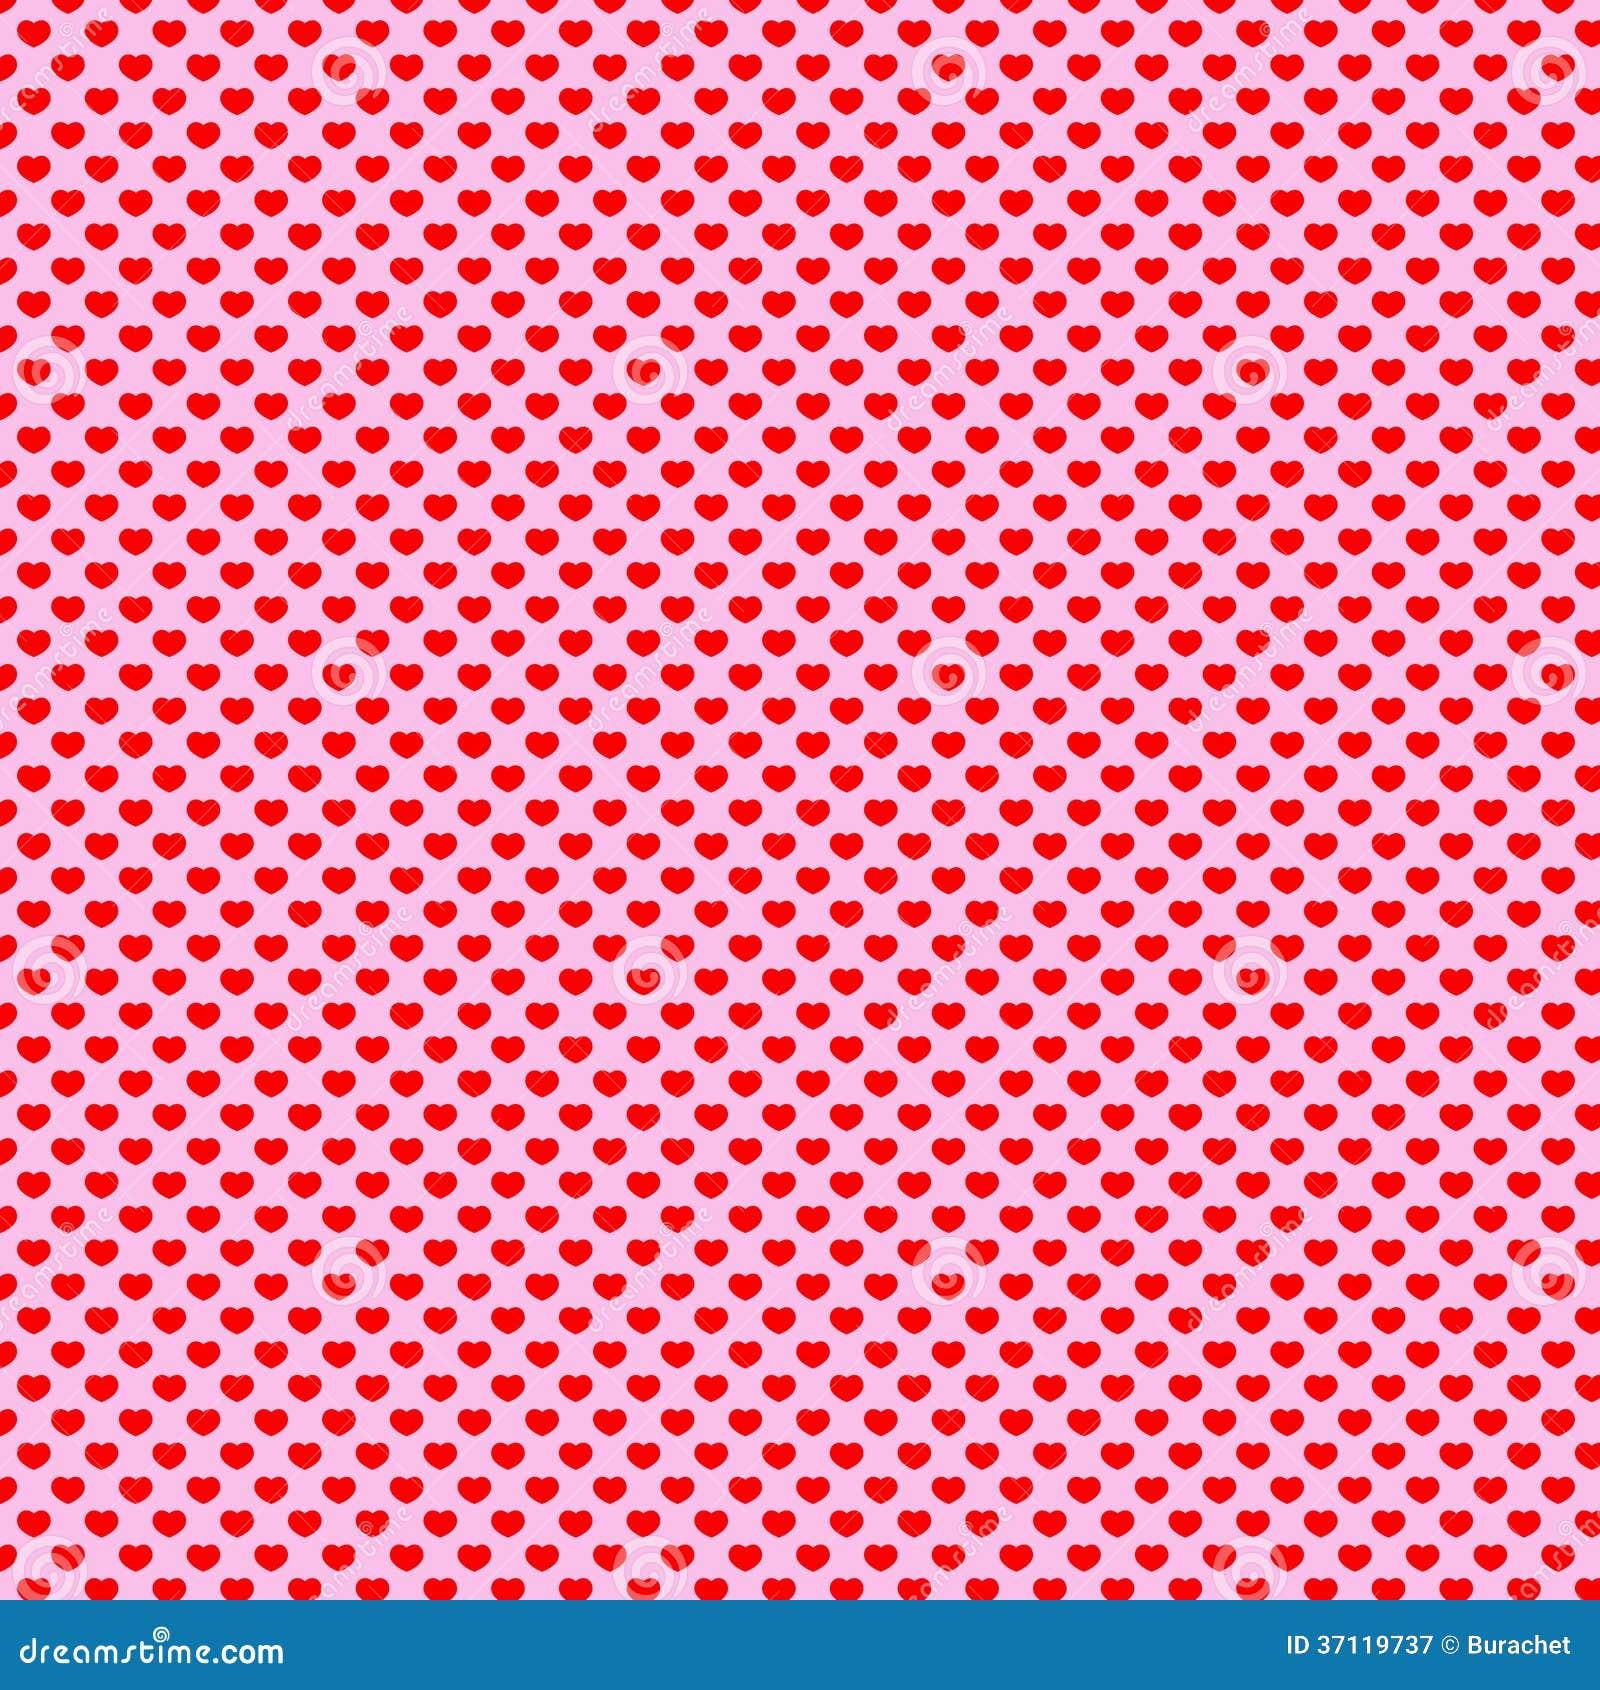 Heart Polka Dot Pattern